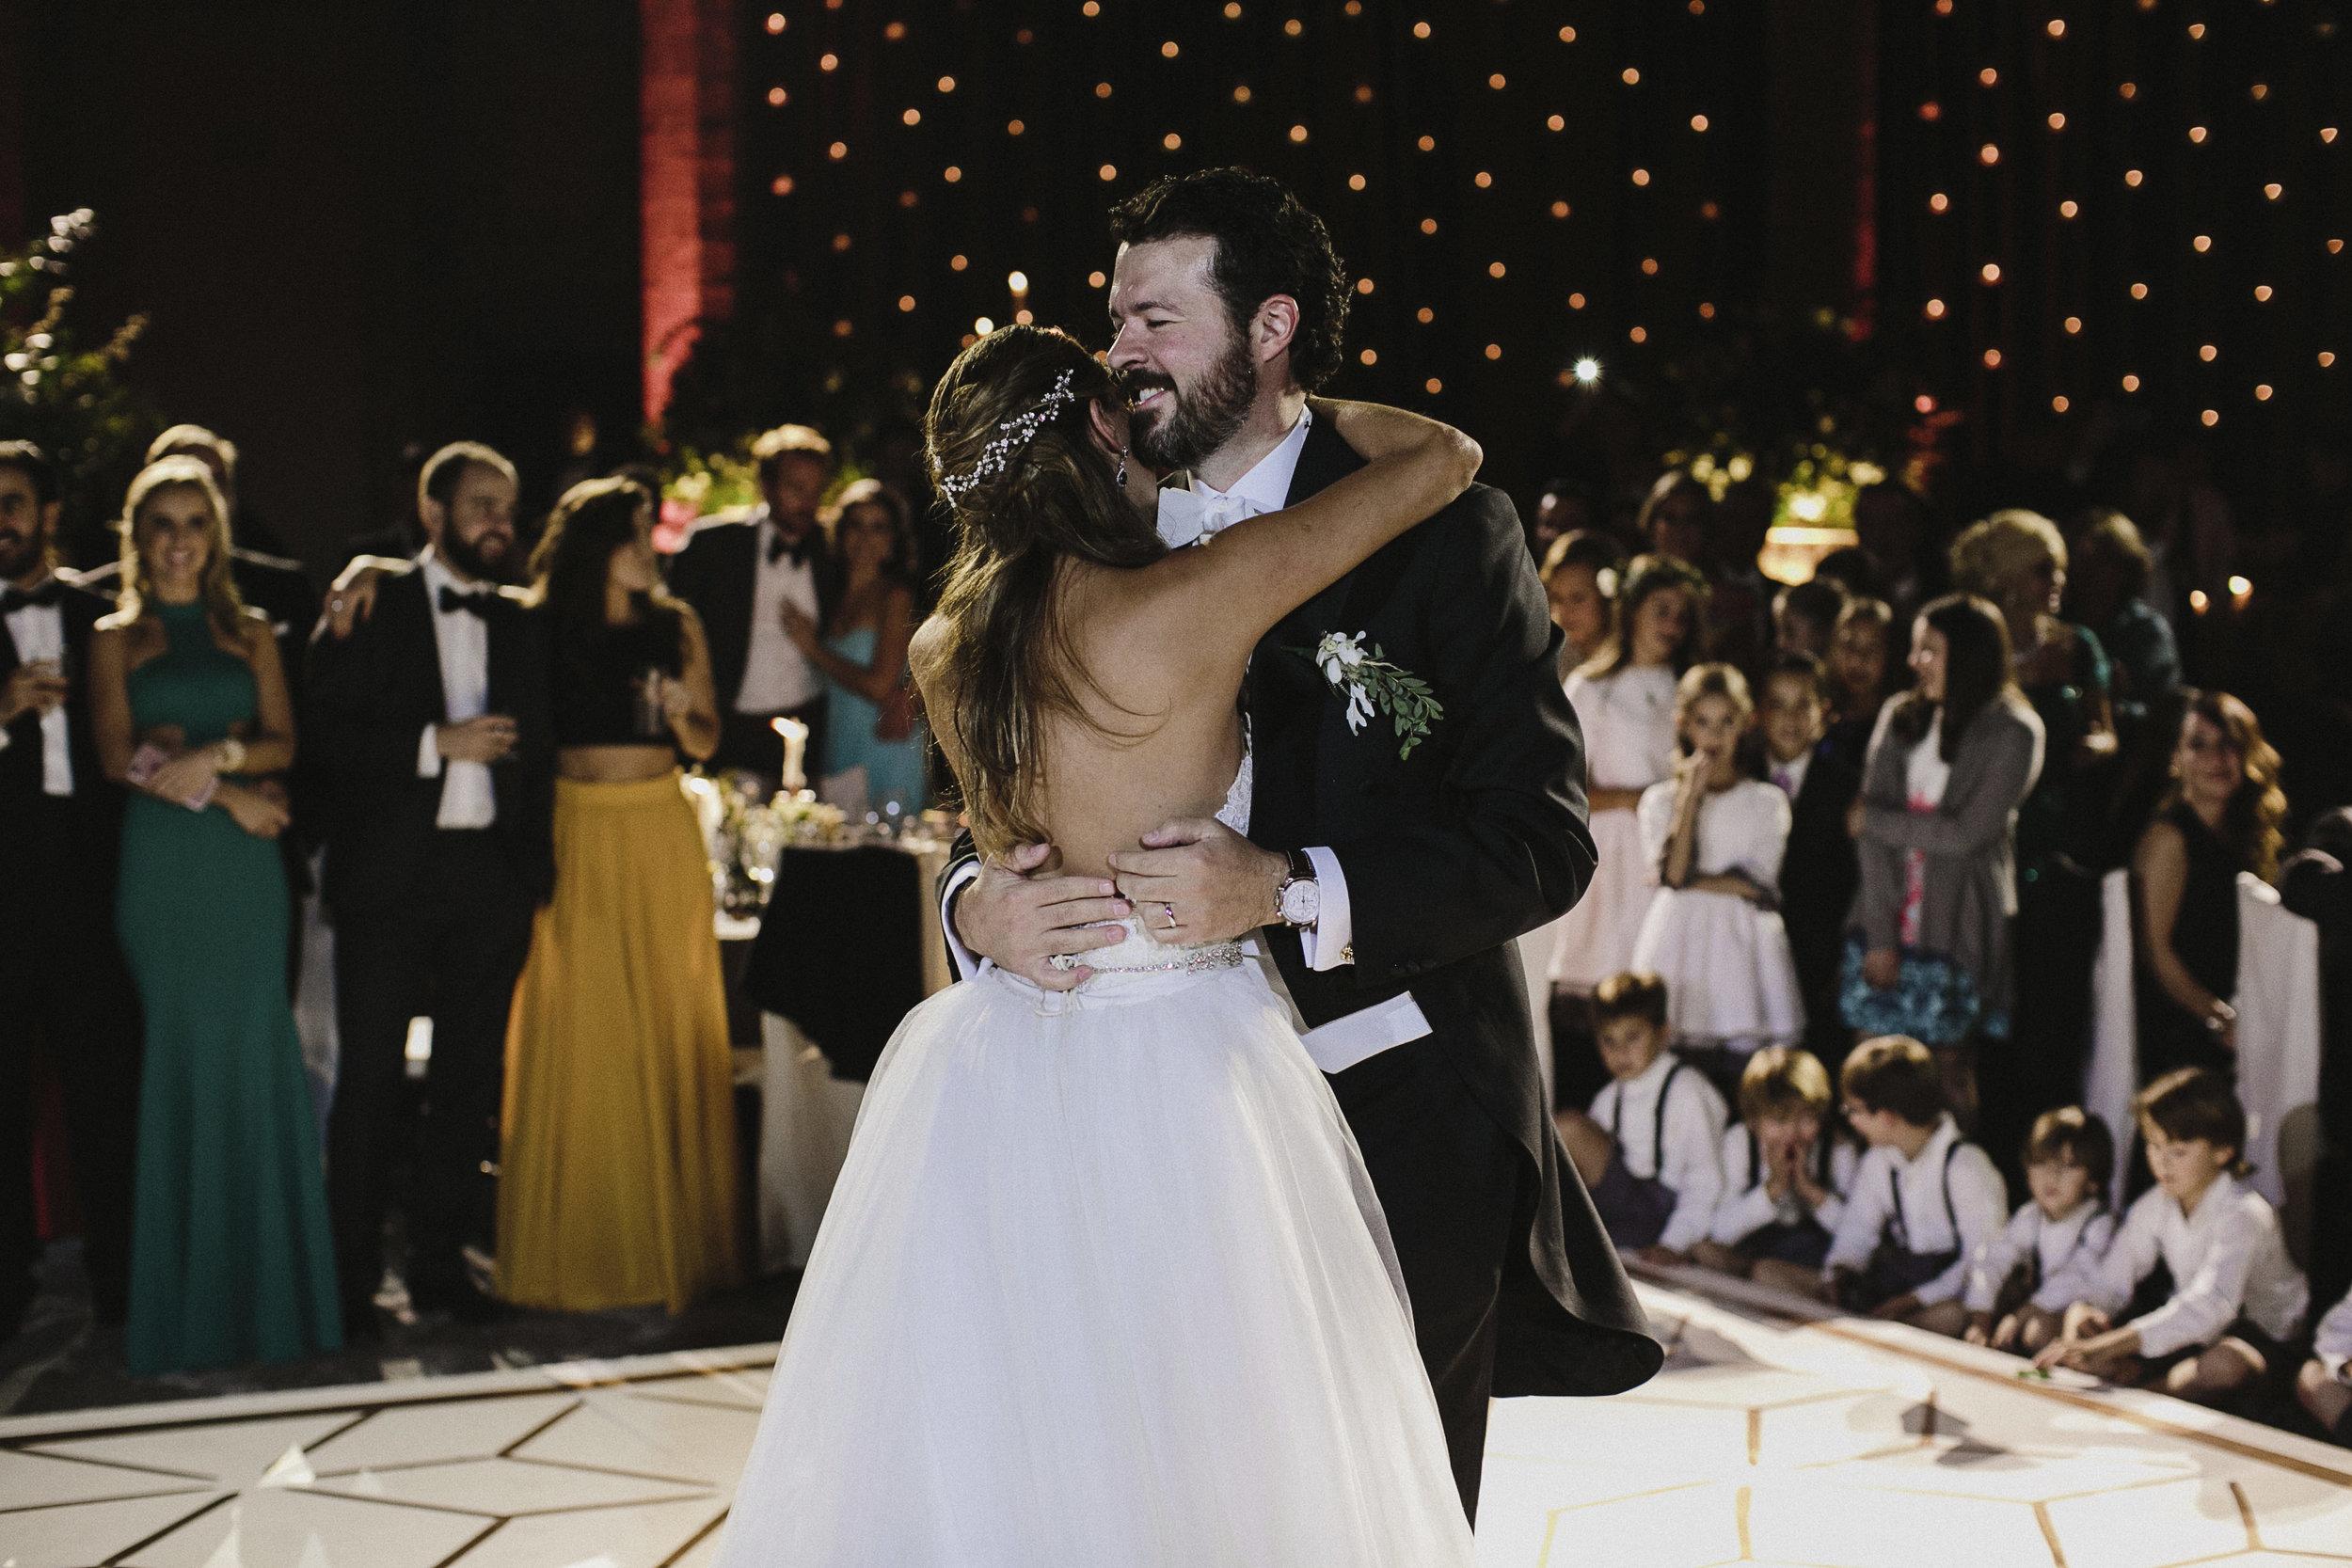 alfonso_flores_destination_wedding_photogrpahy_paola_alonso-953.JPG